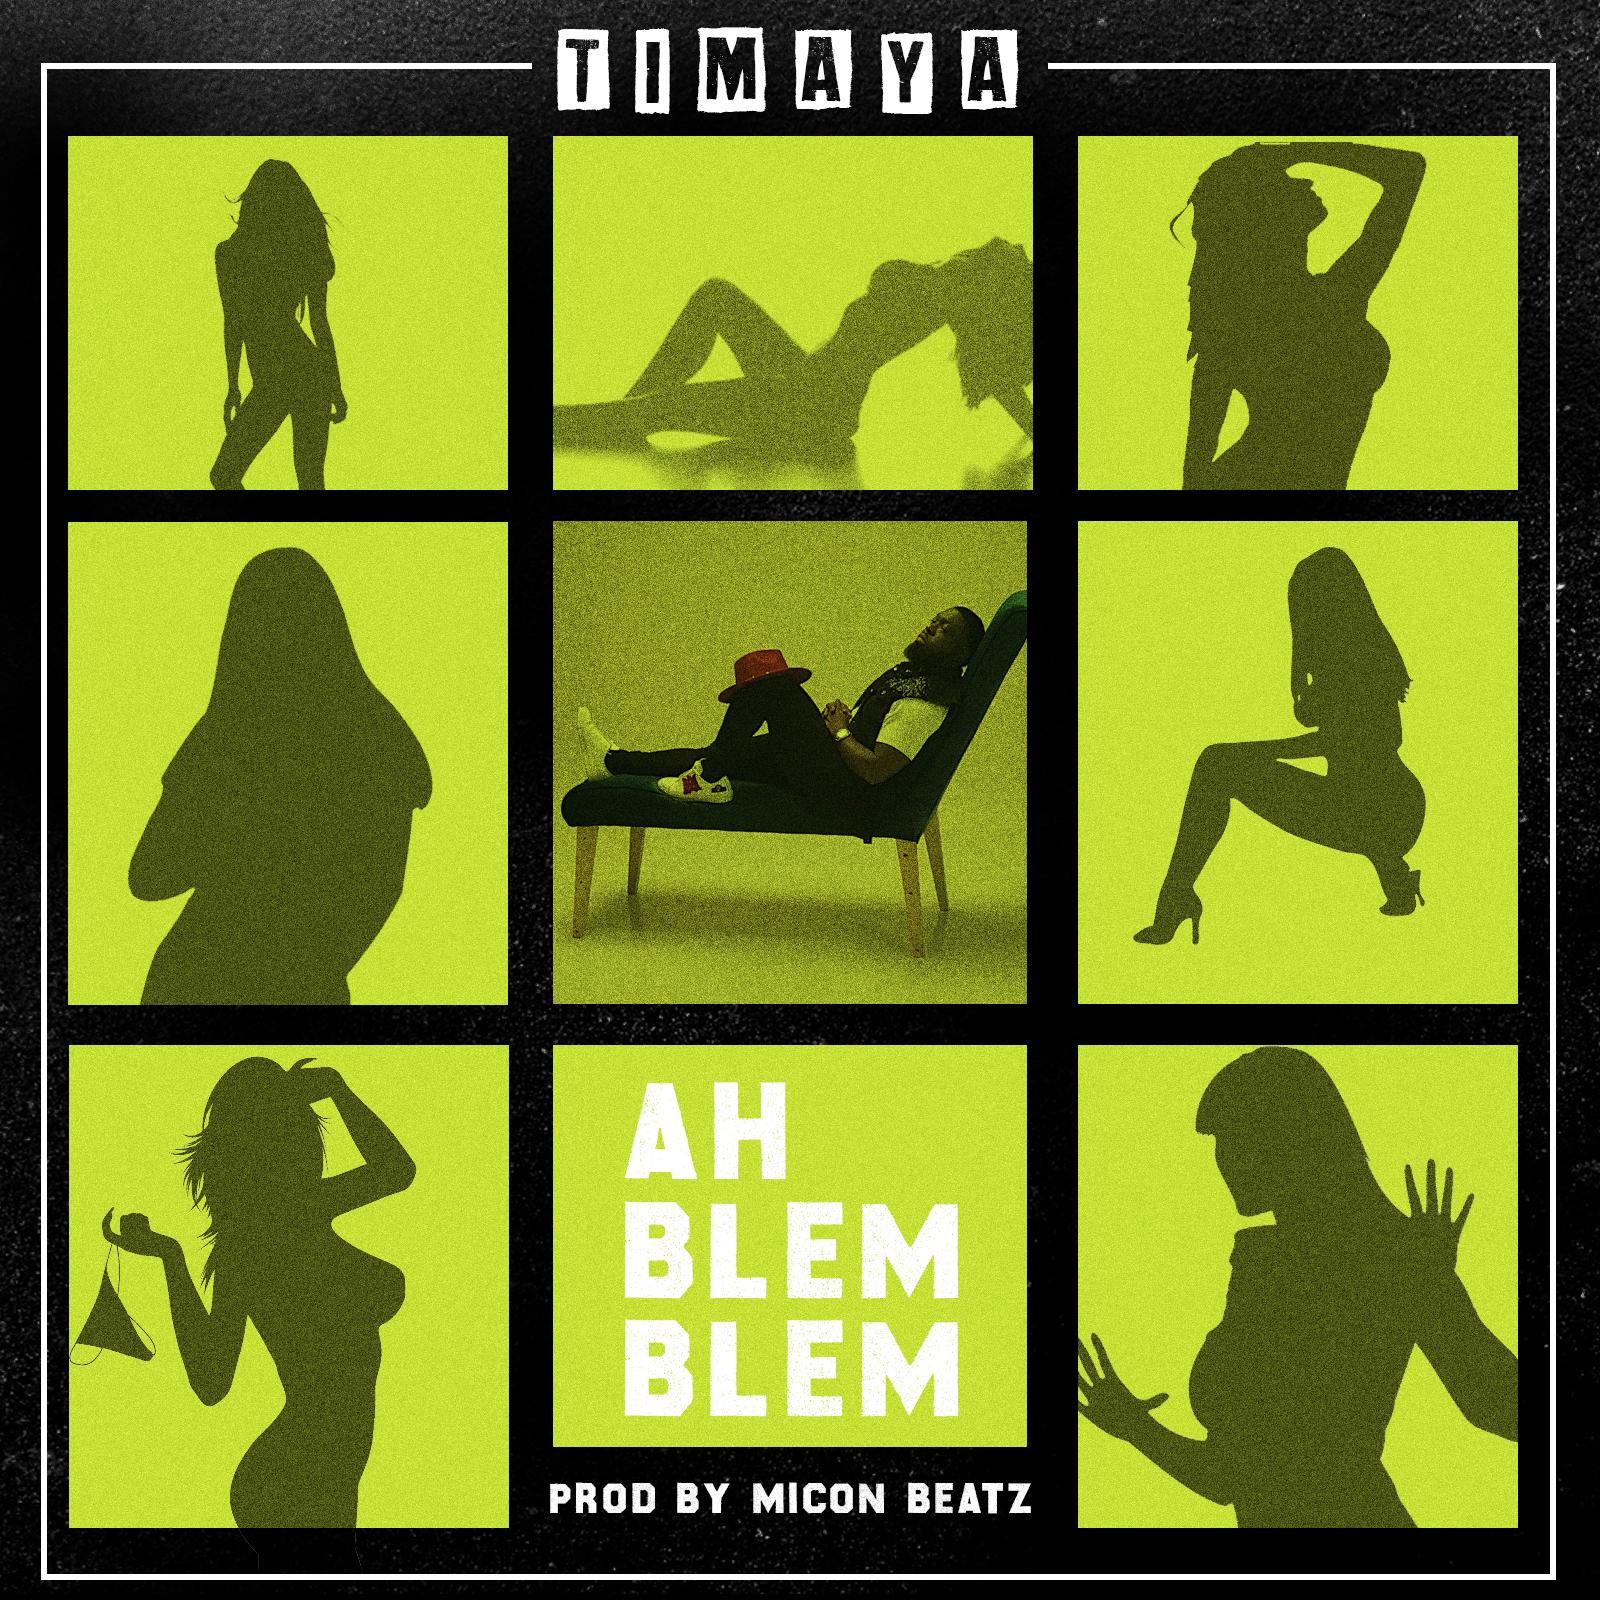 Music: Timaya – Ah Blem Blem